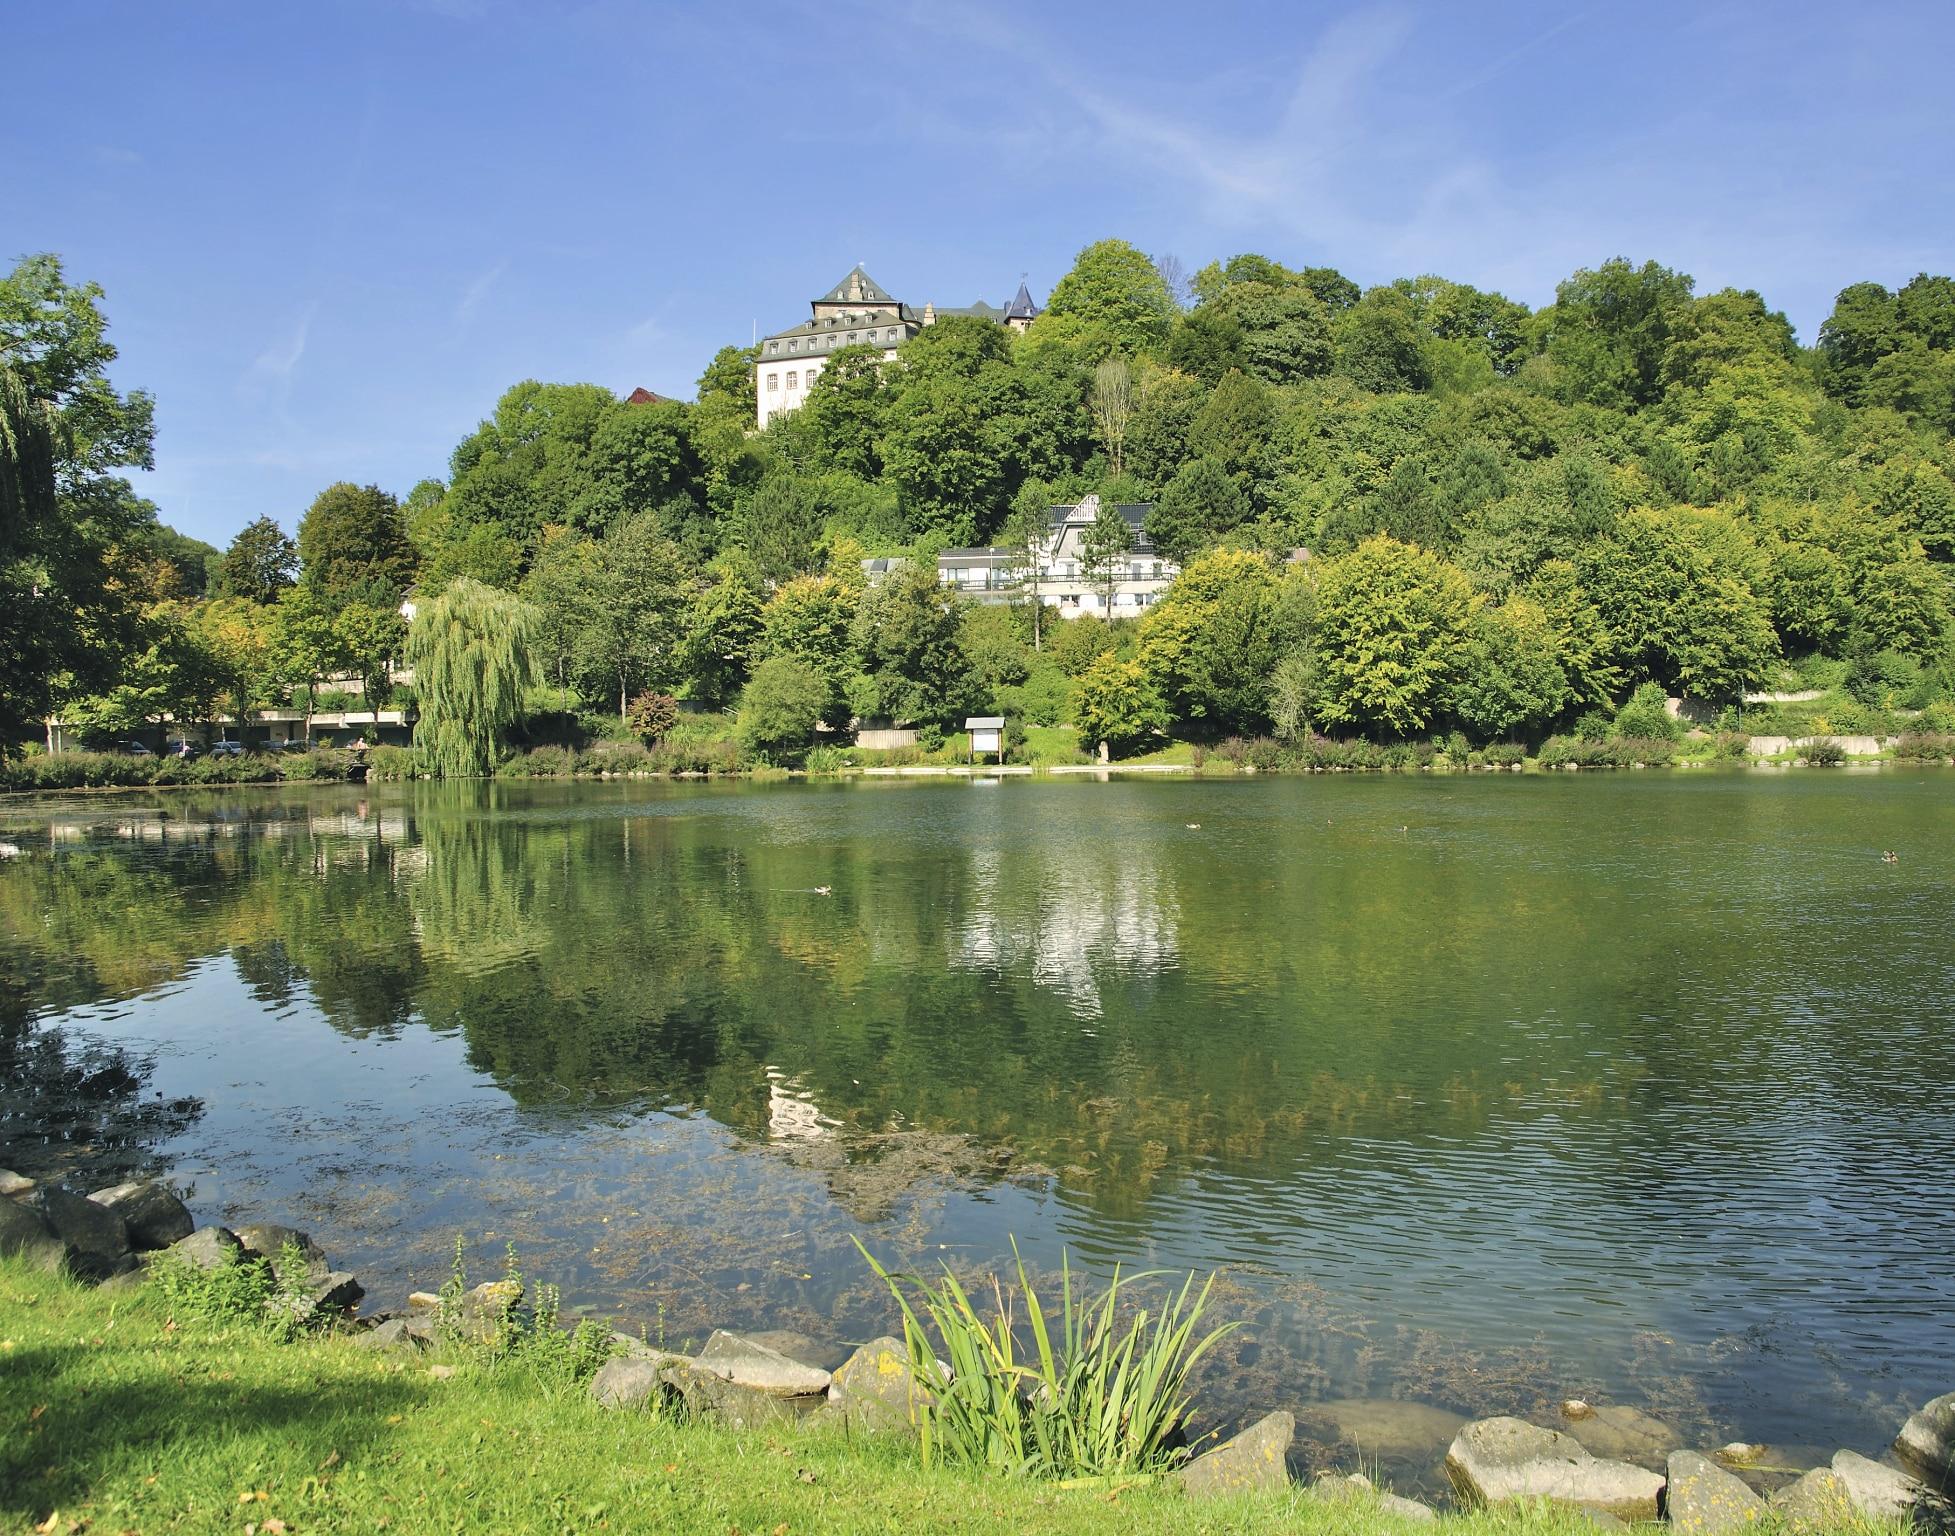 Reisebericht Geopark Vulkaneifel - Wandern in Deutschland